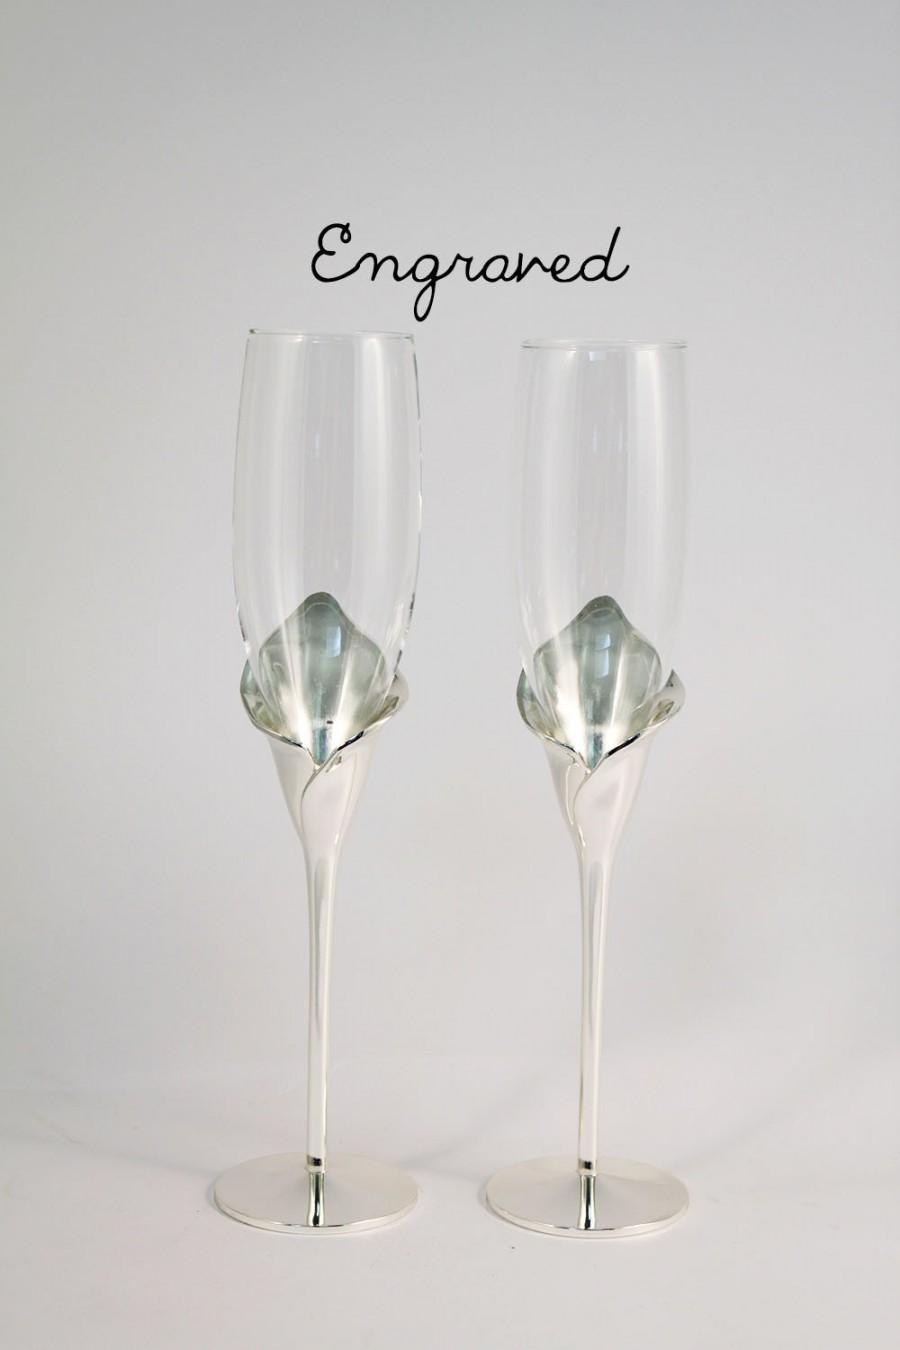 Свадьба - Engraved Wedding Toasting Flutes - Calla Lily Wedding Champagne Flutes - Personalized Wedding Toasting Flutes - Wedding Keepsake - Flutes